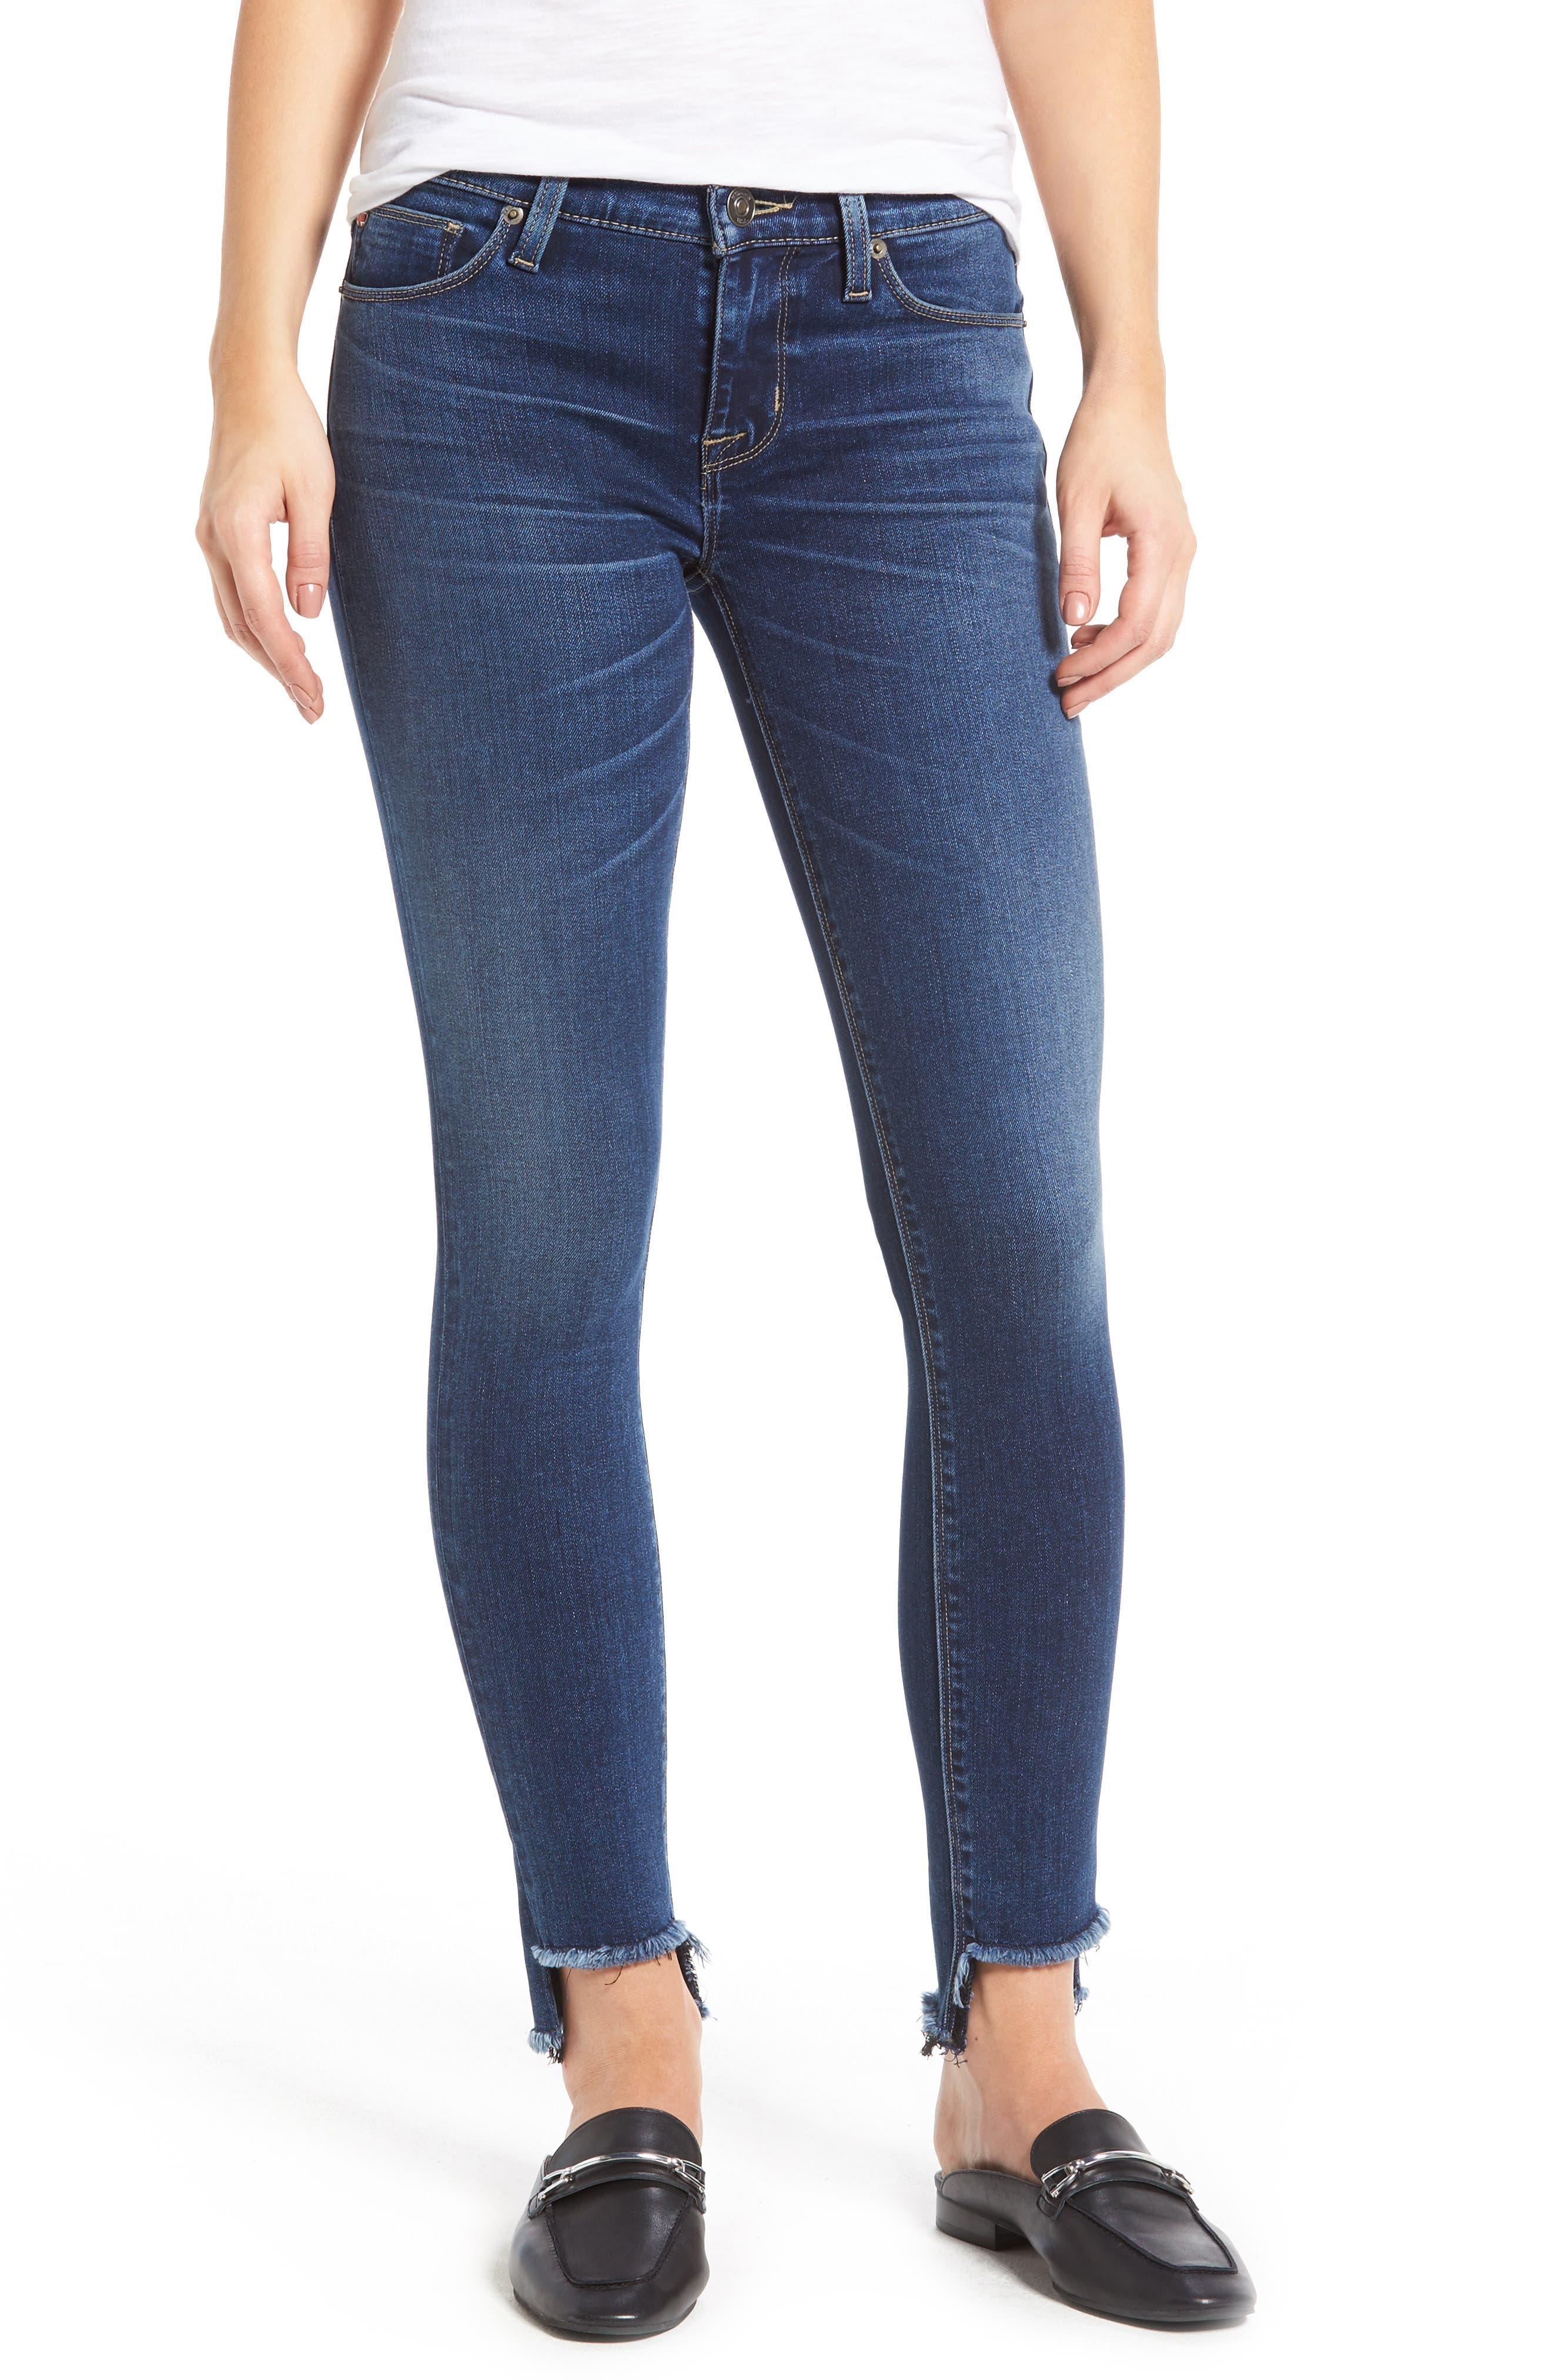 Main Image - Hudson Jeans Colette Step Hem Skinny Jeans (Backbone)